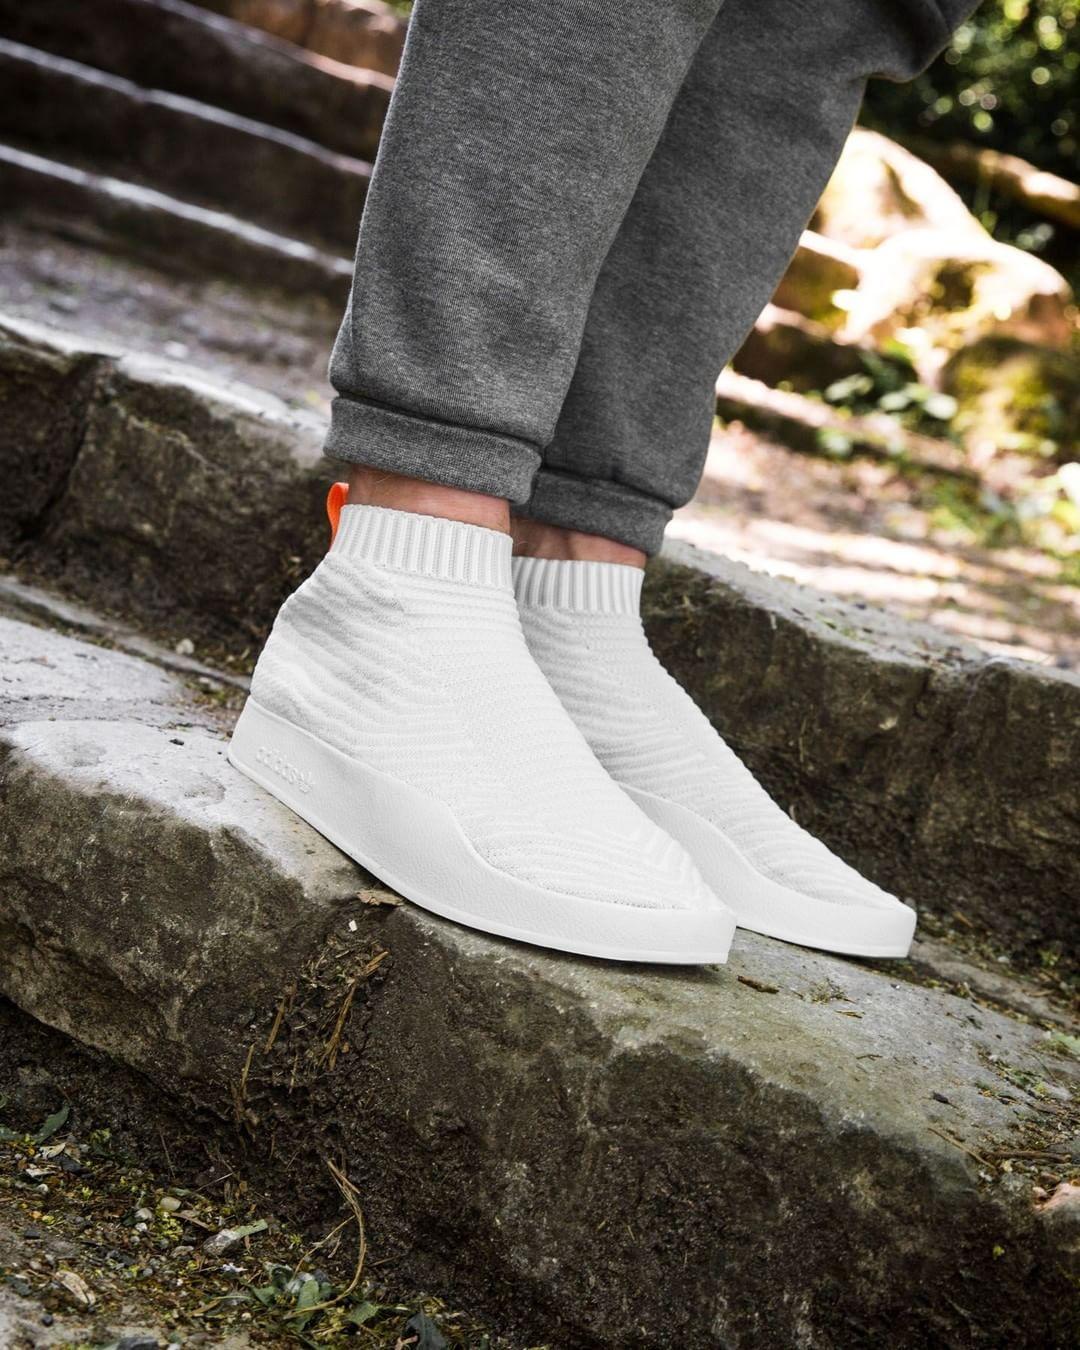 Primeknit 23 Didas Sock Priced 173 SummerEu 40 47 Adilette Tl1JcFK